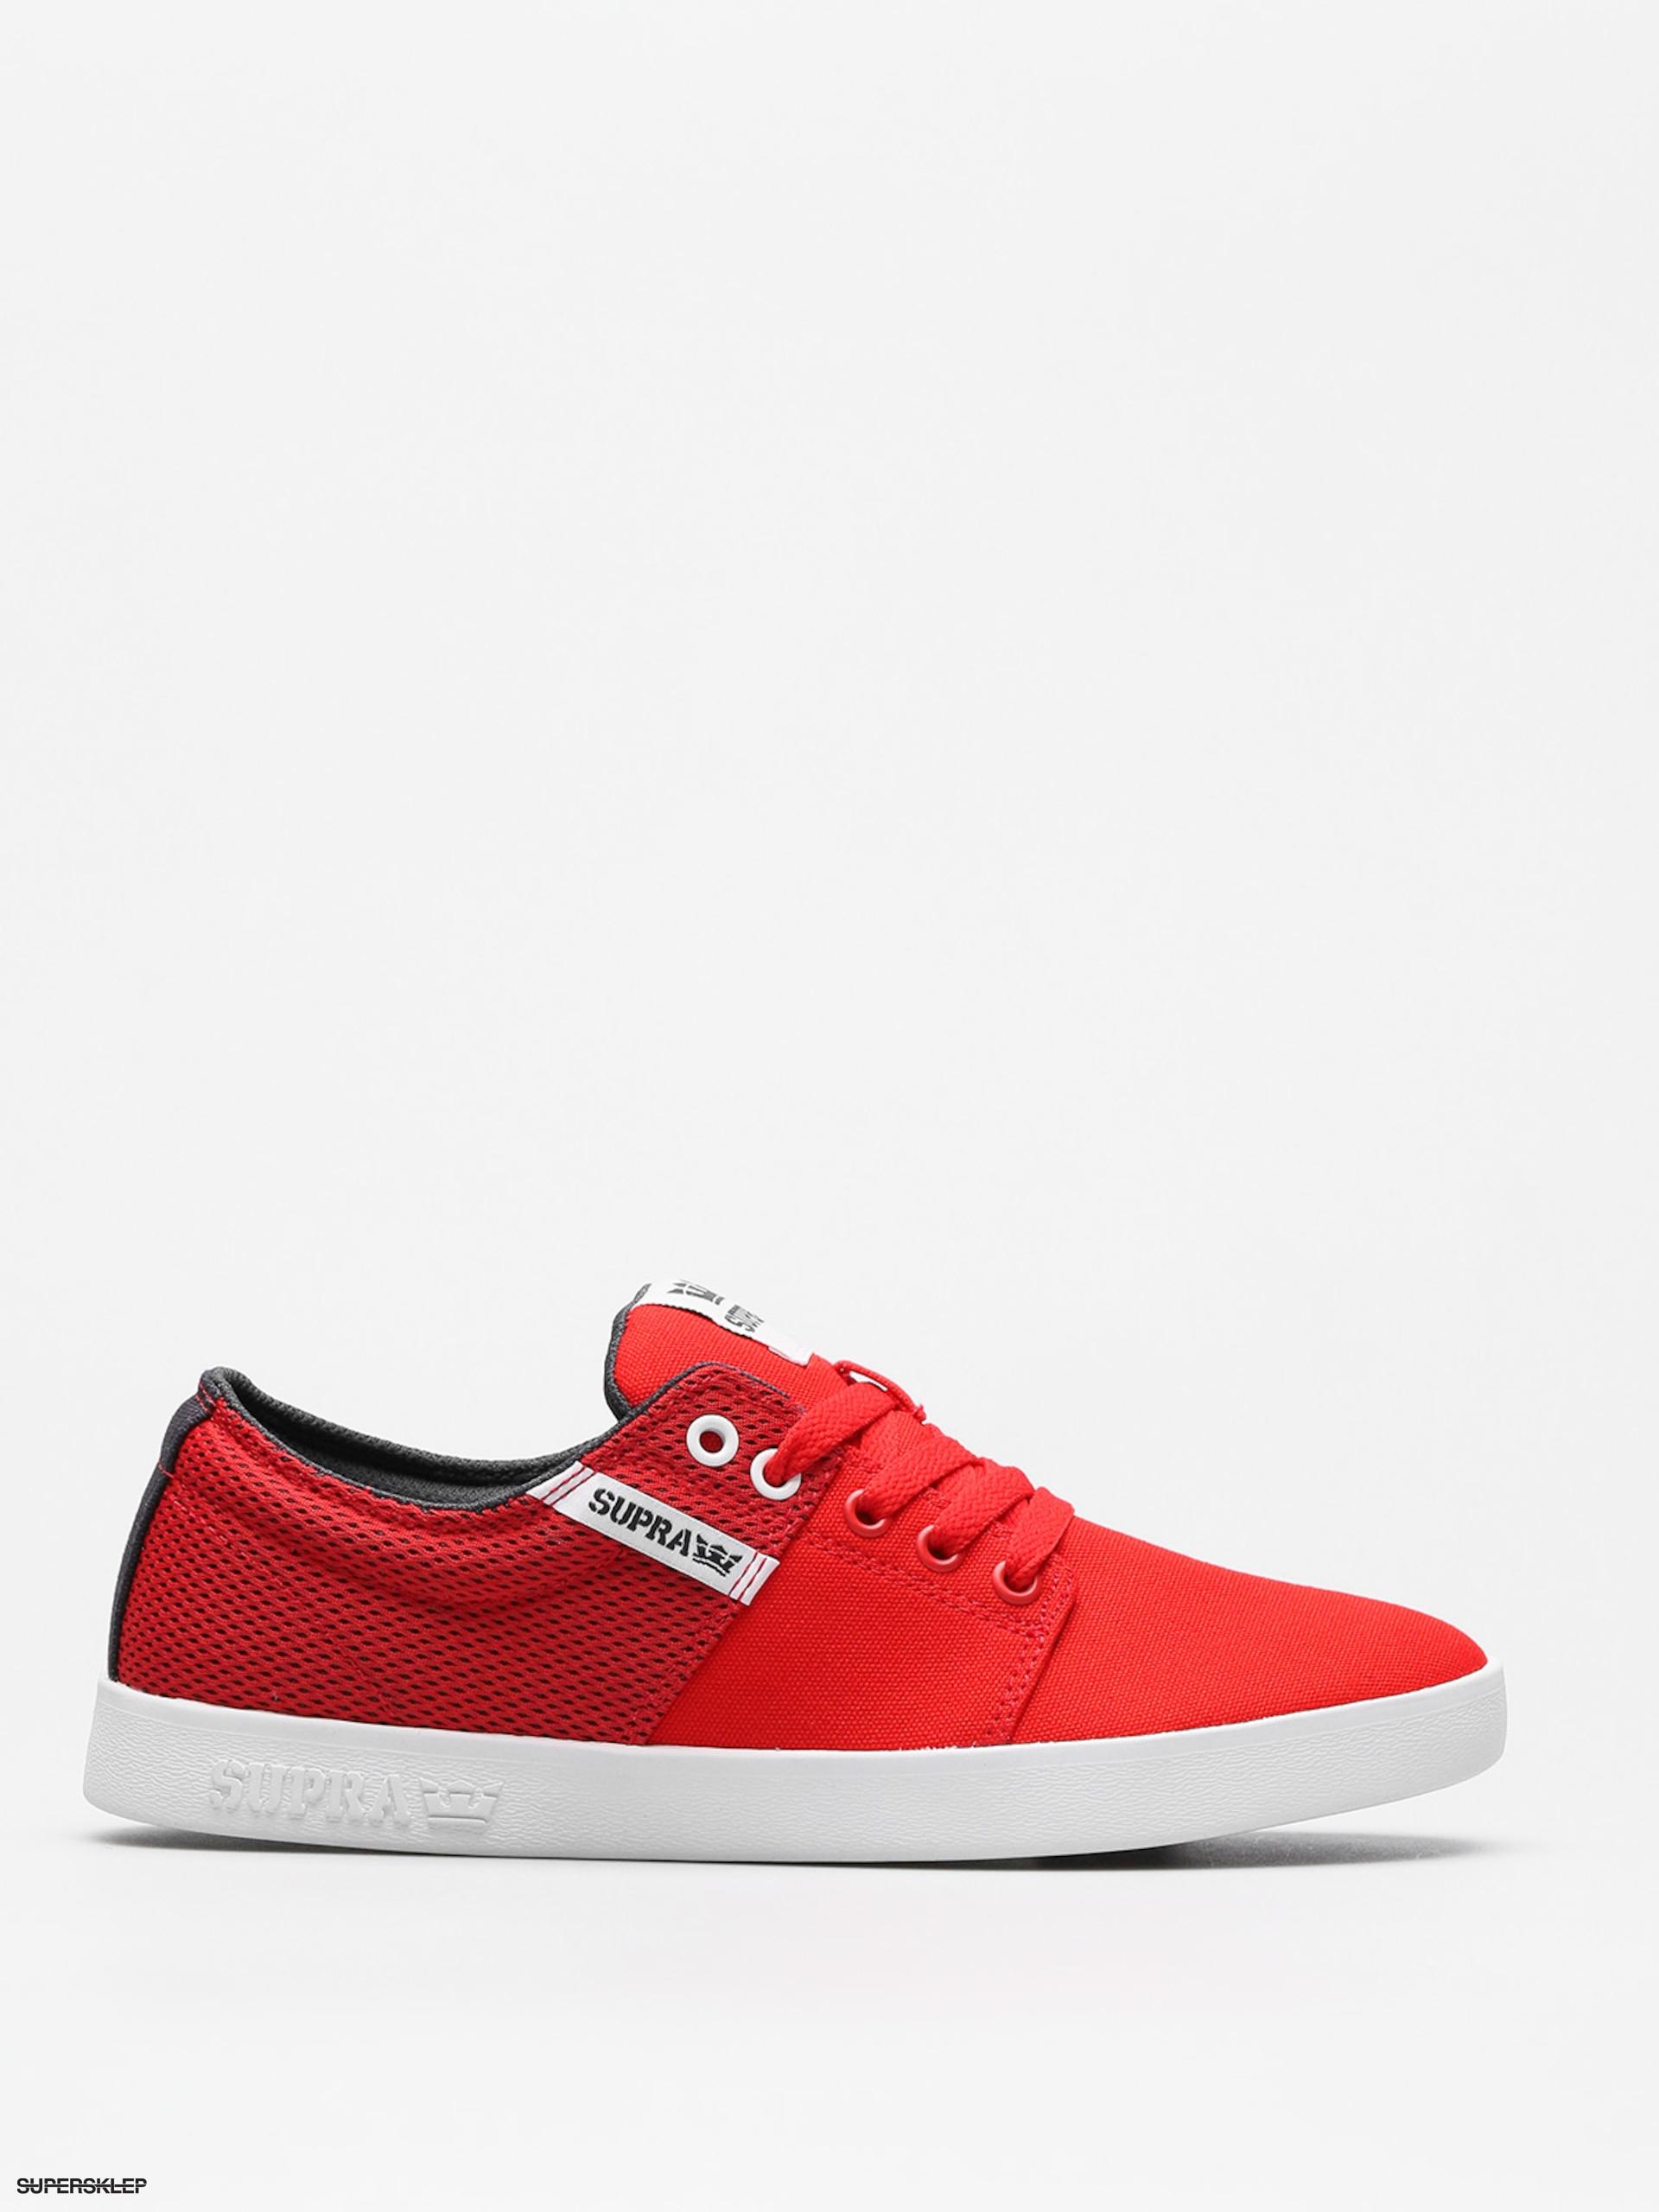 Topánky Supra Stacks II (risk red navy white) f9e45b188f1